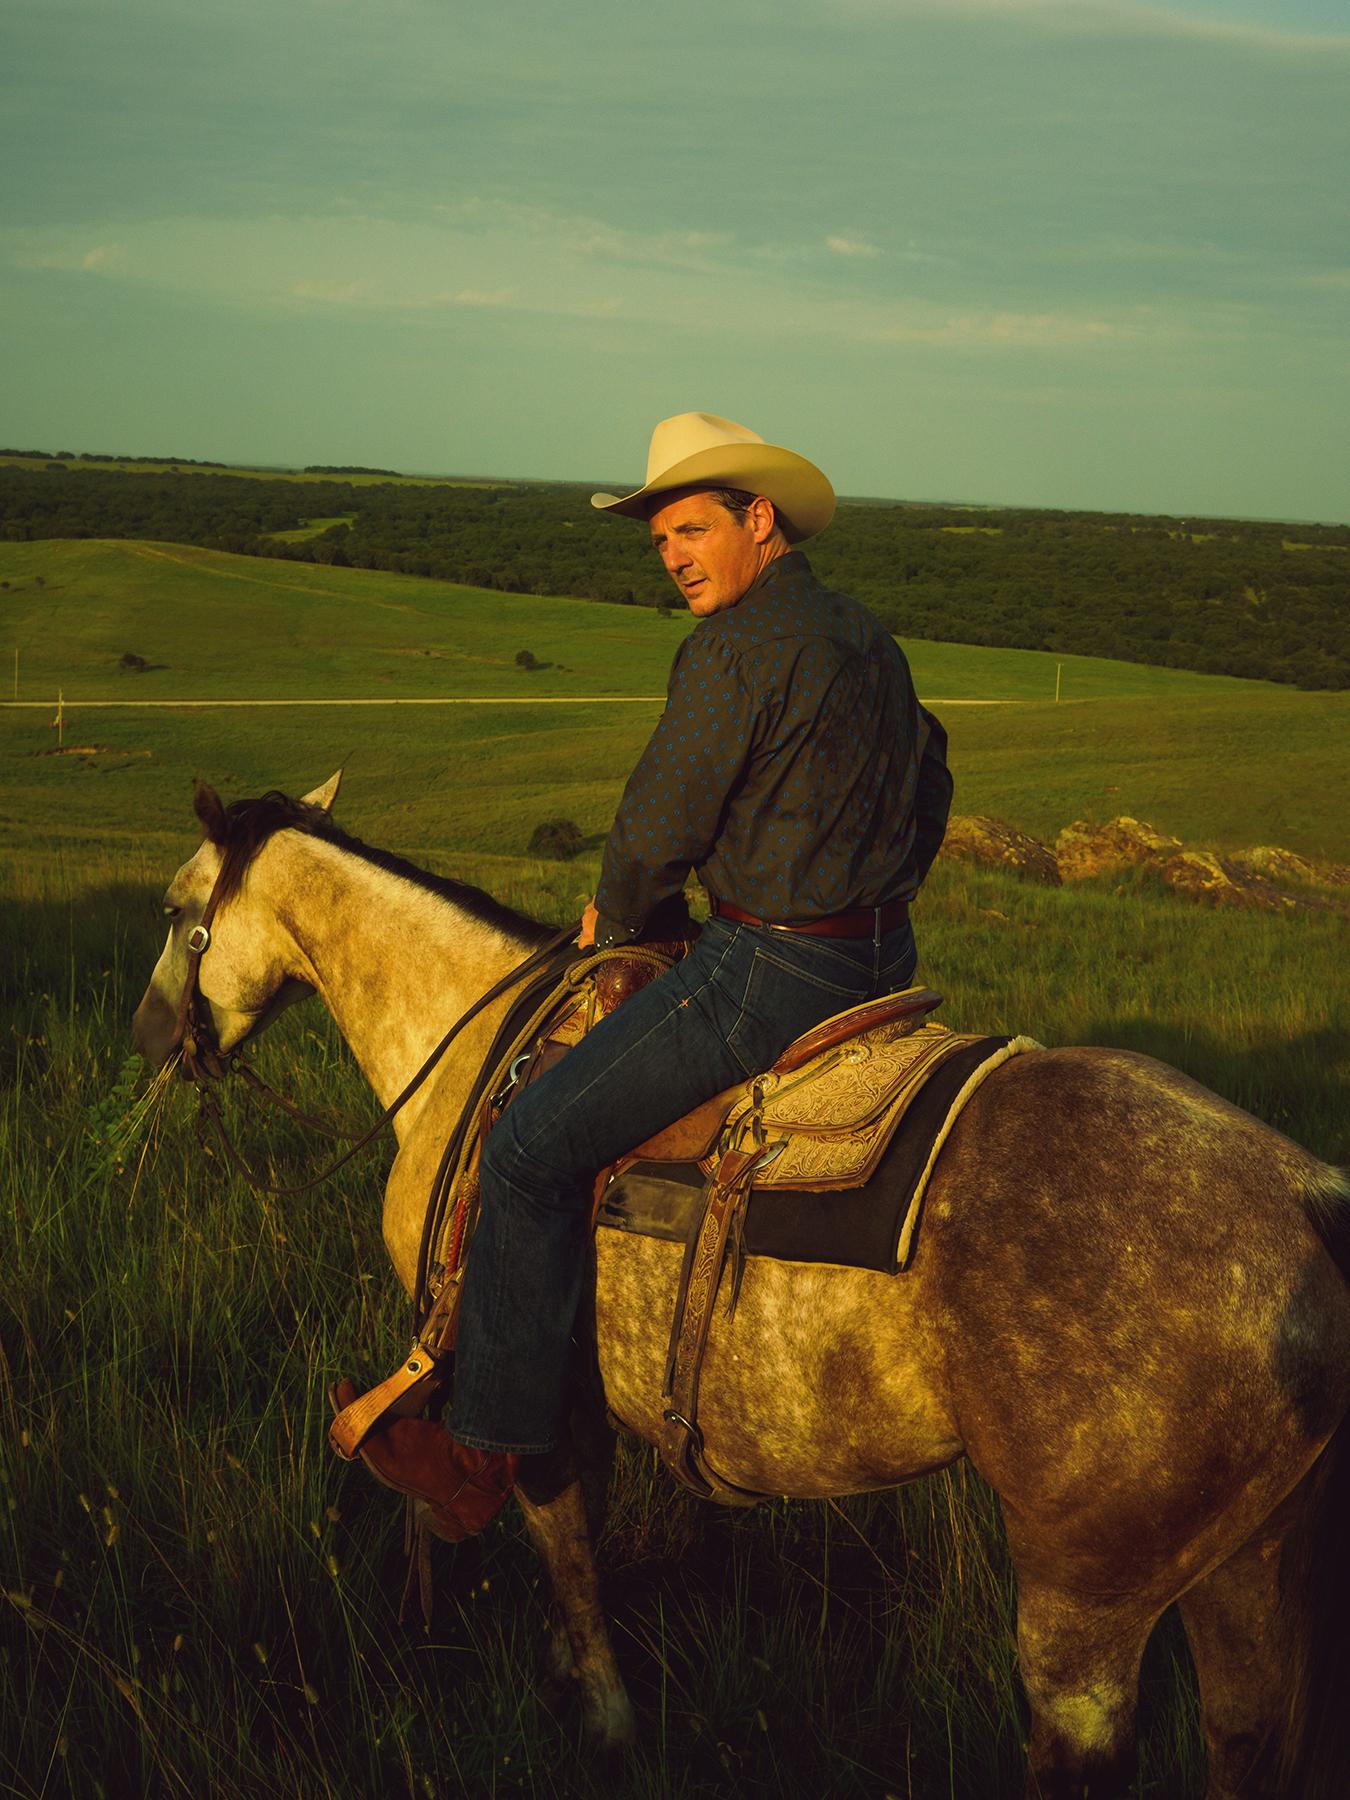 Sturgill Simpson in Oklahoma, August 2021.